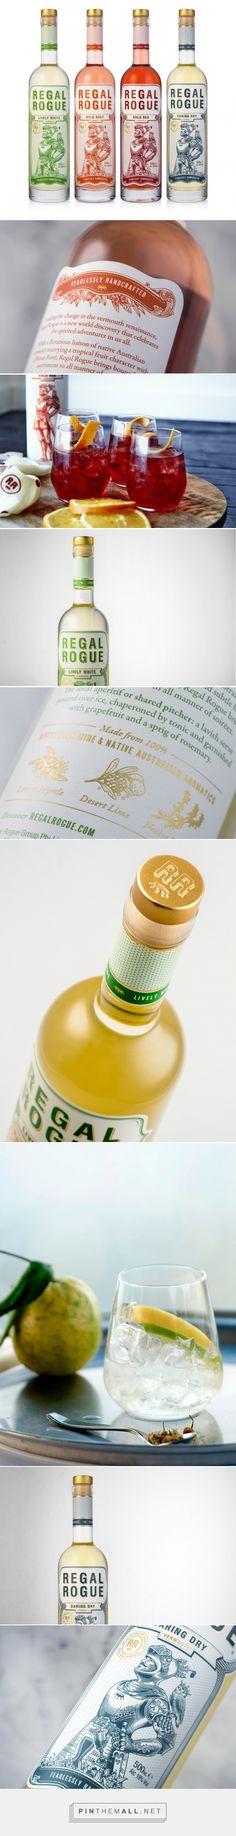 Regal Rogue wine packaging designed by Squad Ink, Design Studio - http://www.packagingoftheworld.com/2015/11/regal-rogue.html